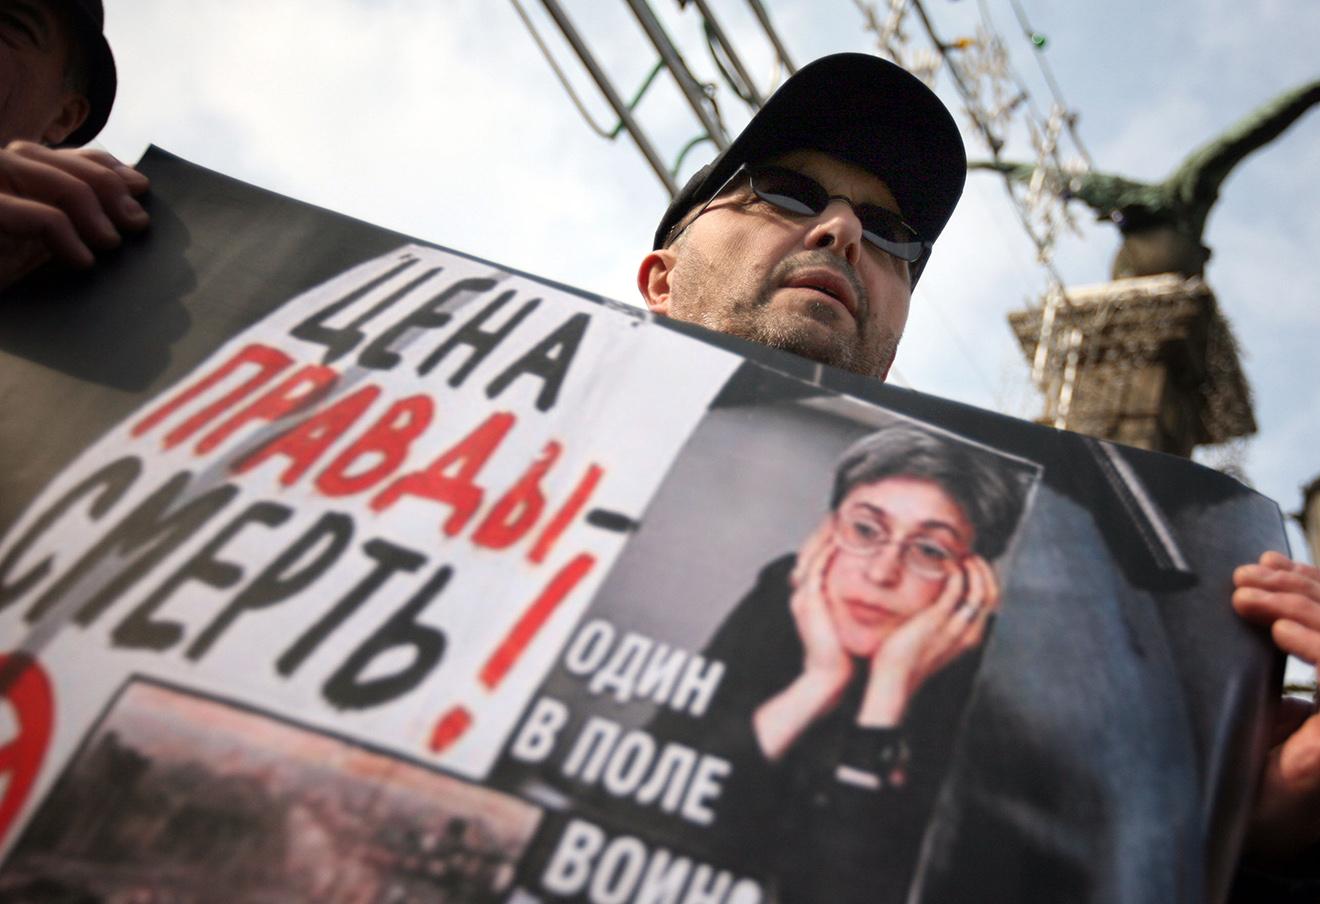 Акция протеста против визита Владимира Путина. Болгария, София, 2008 год. Фото: Павел Головокин / AP / East News